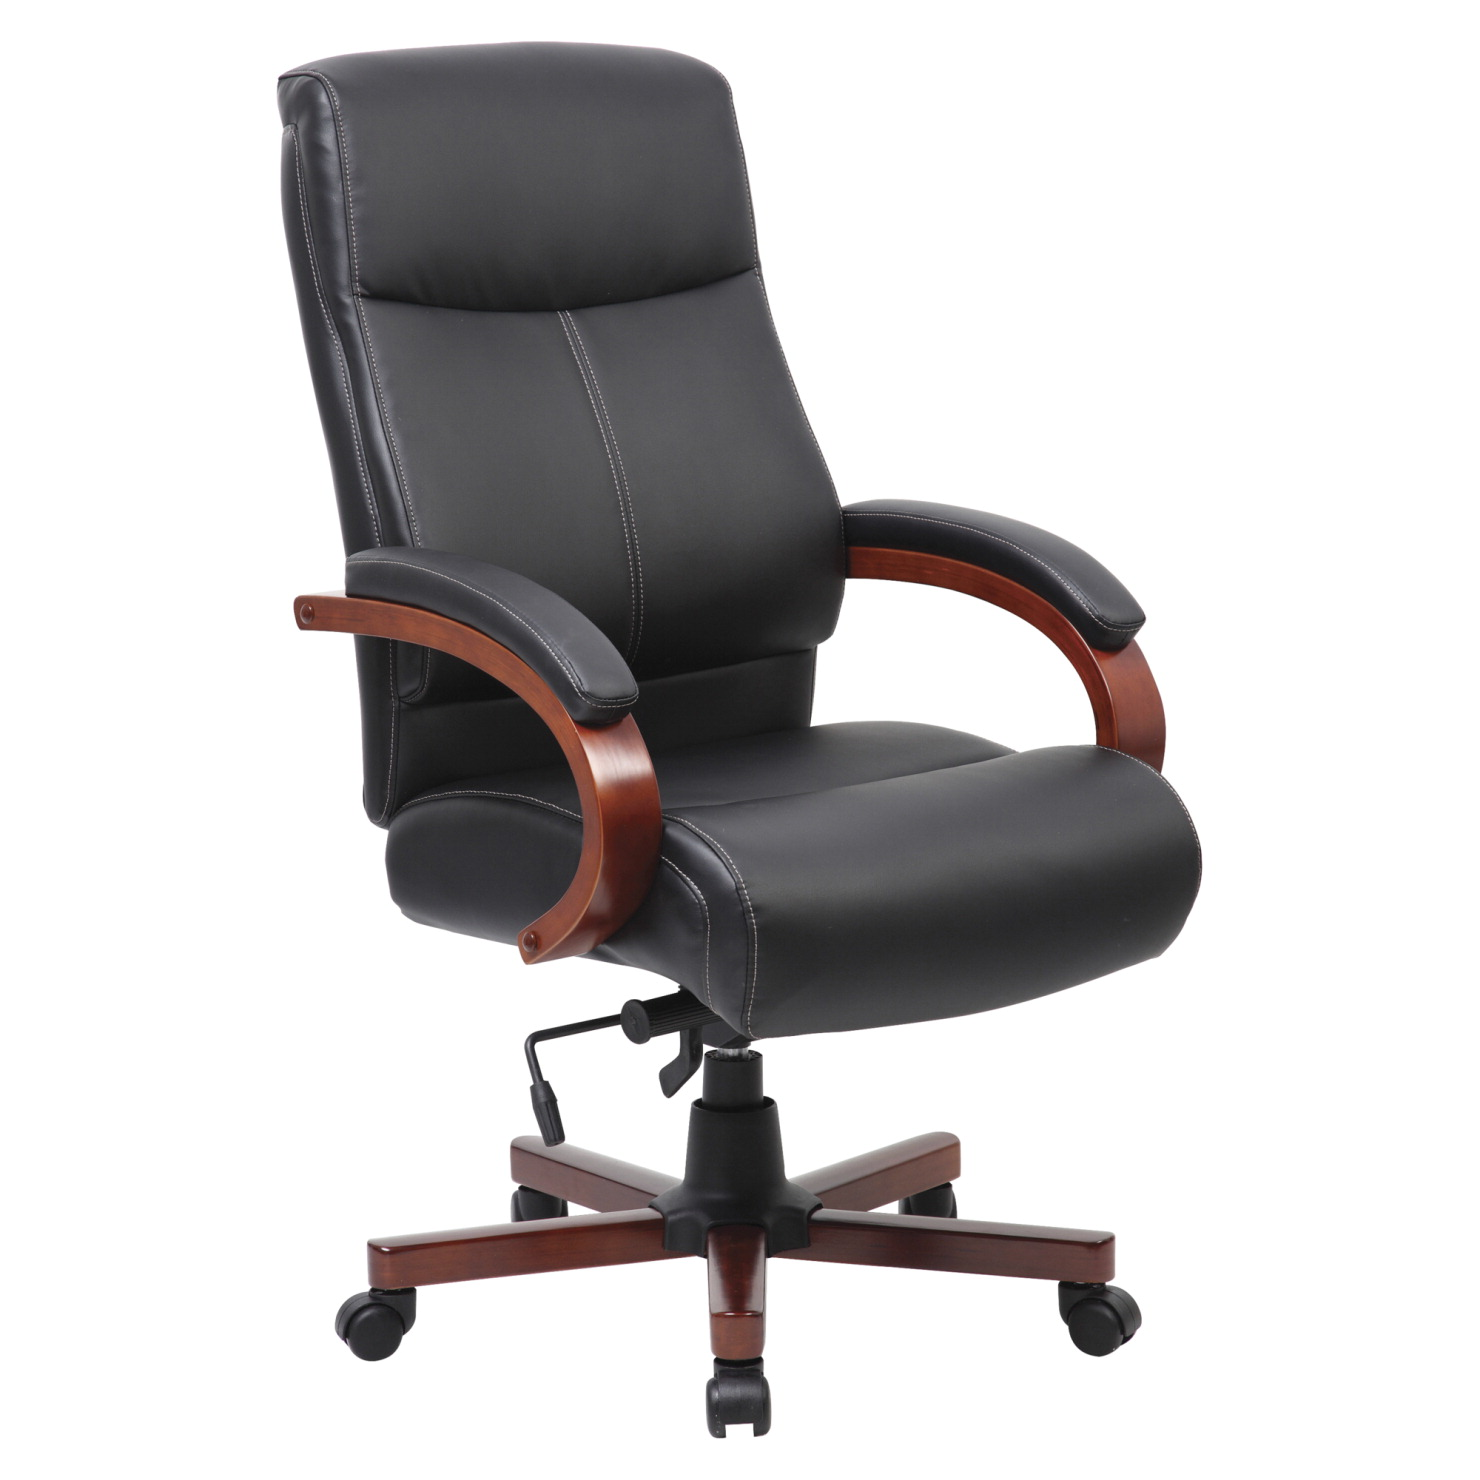 Enjoyable Lorell Executive High Back Leather Chair 27 X 31 X 47 Inches Black Mahogany Evergreenethics Interior Chair Design Evergreenethicsorg